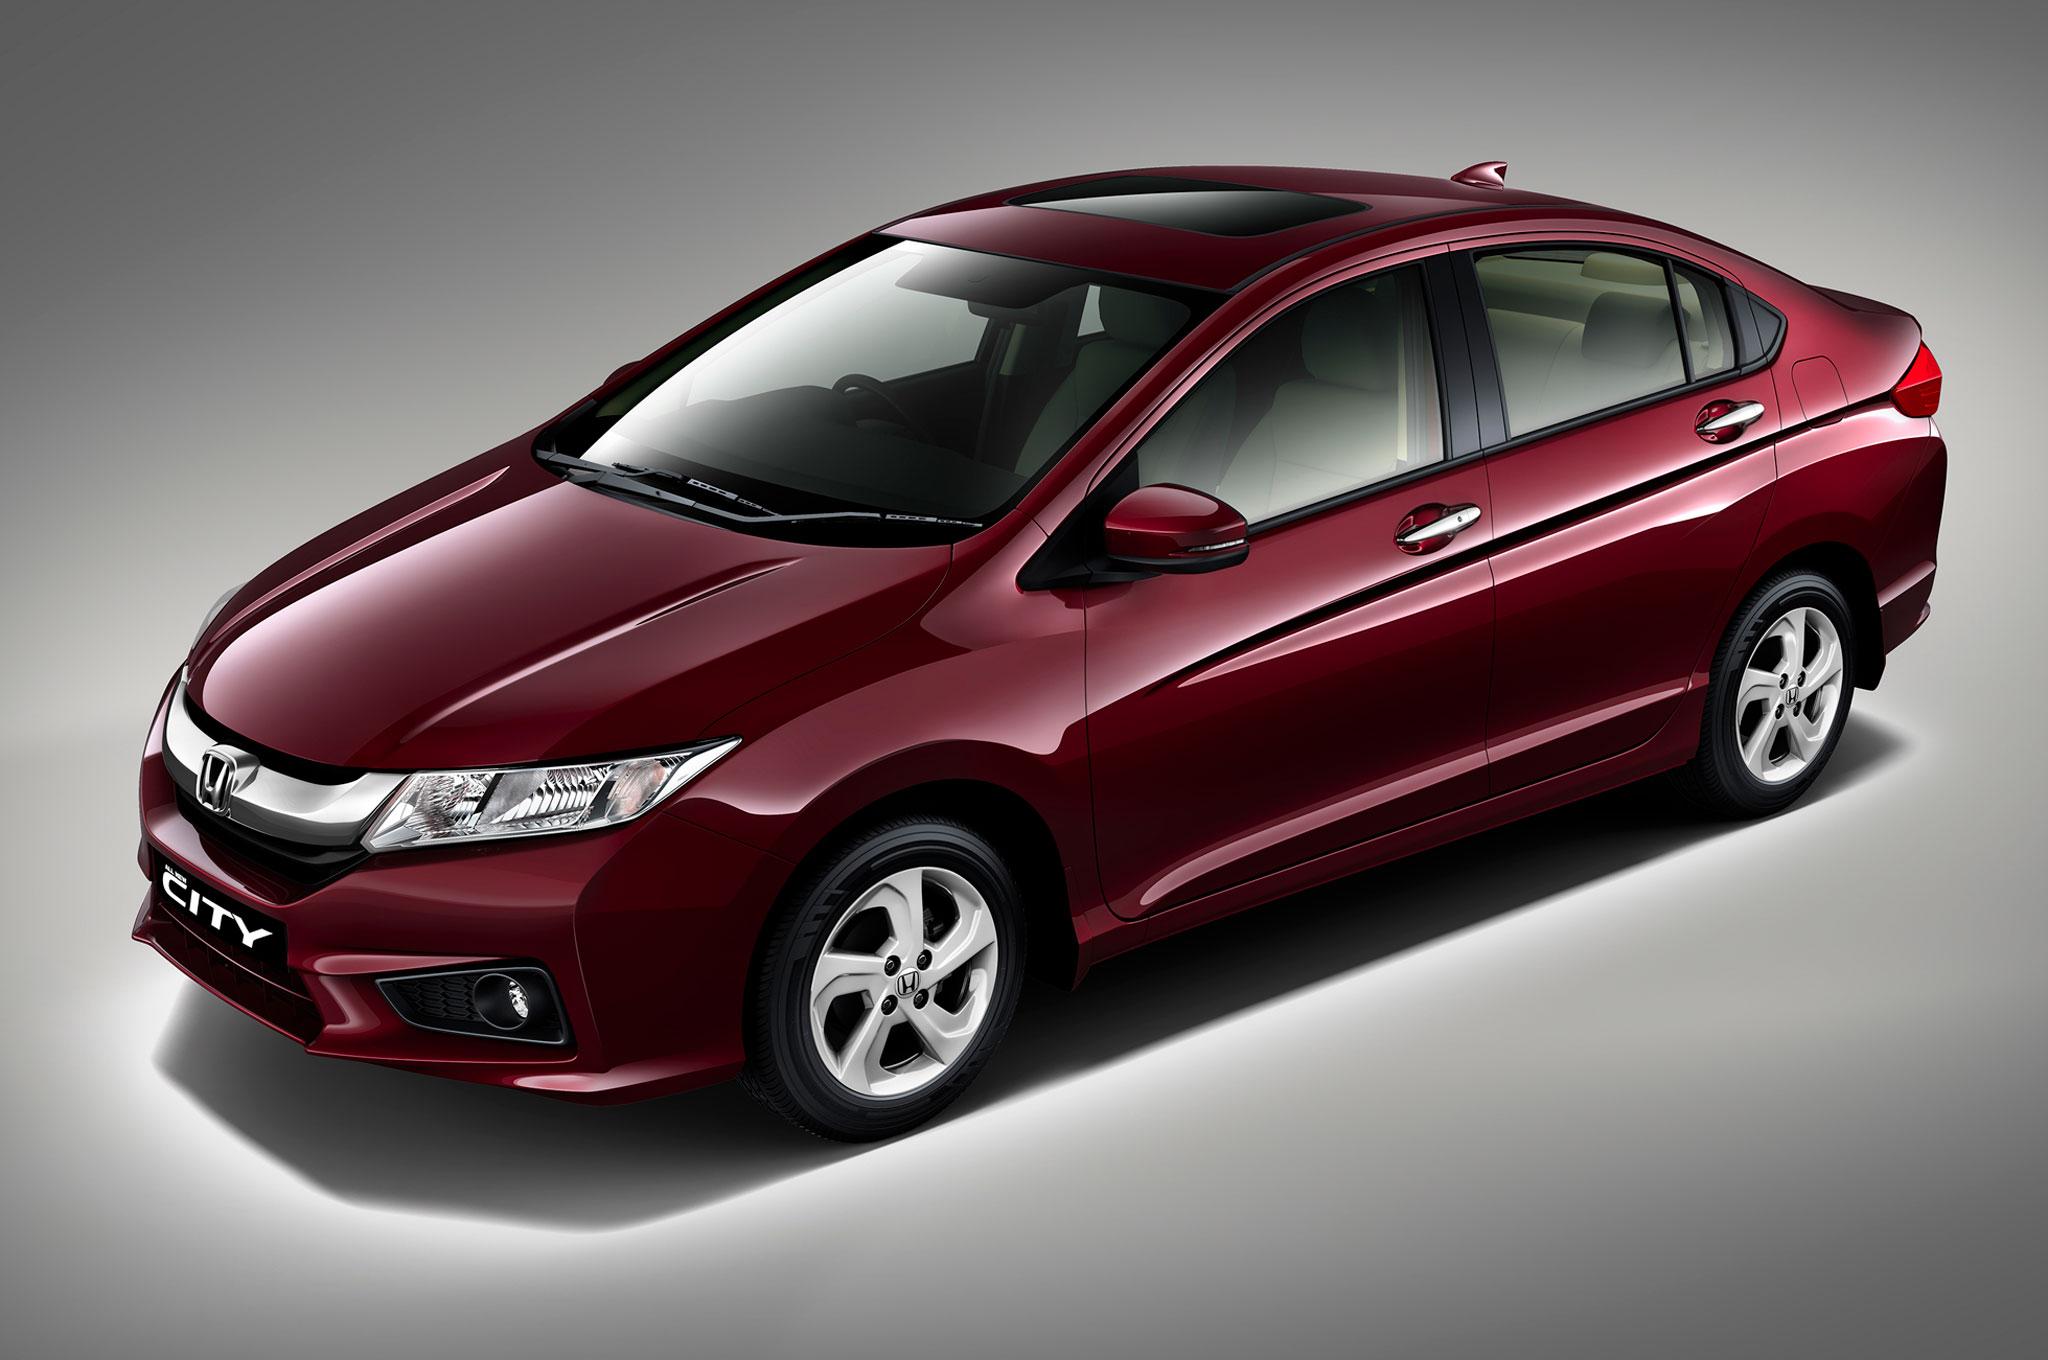 Delightful Honda Fit Hybrid